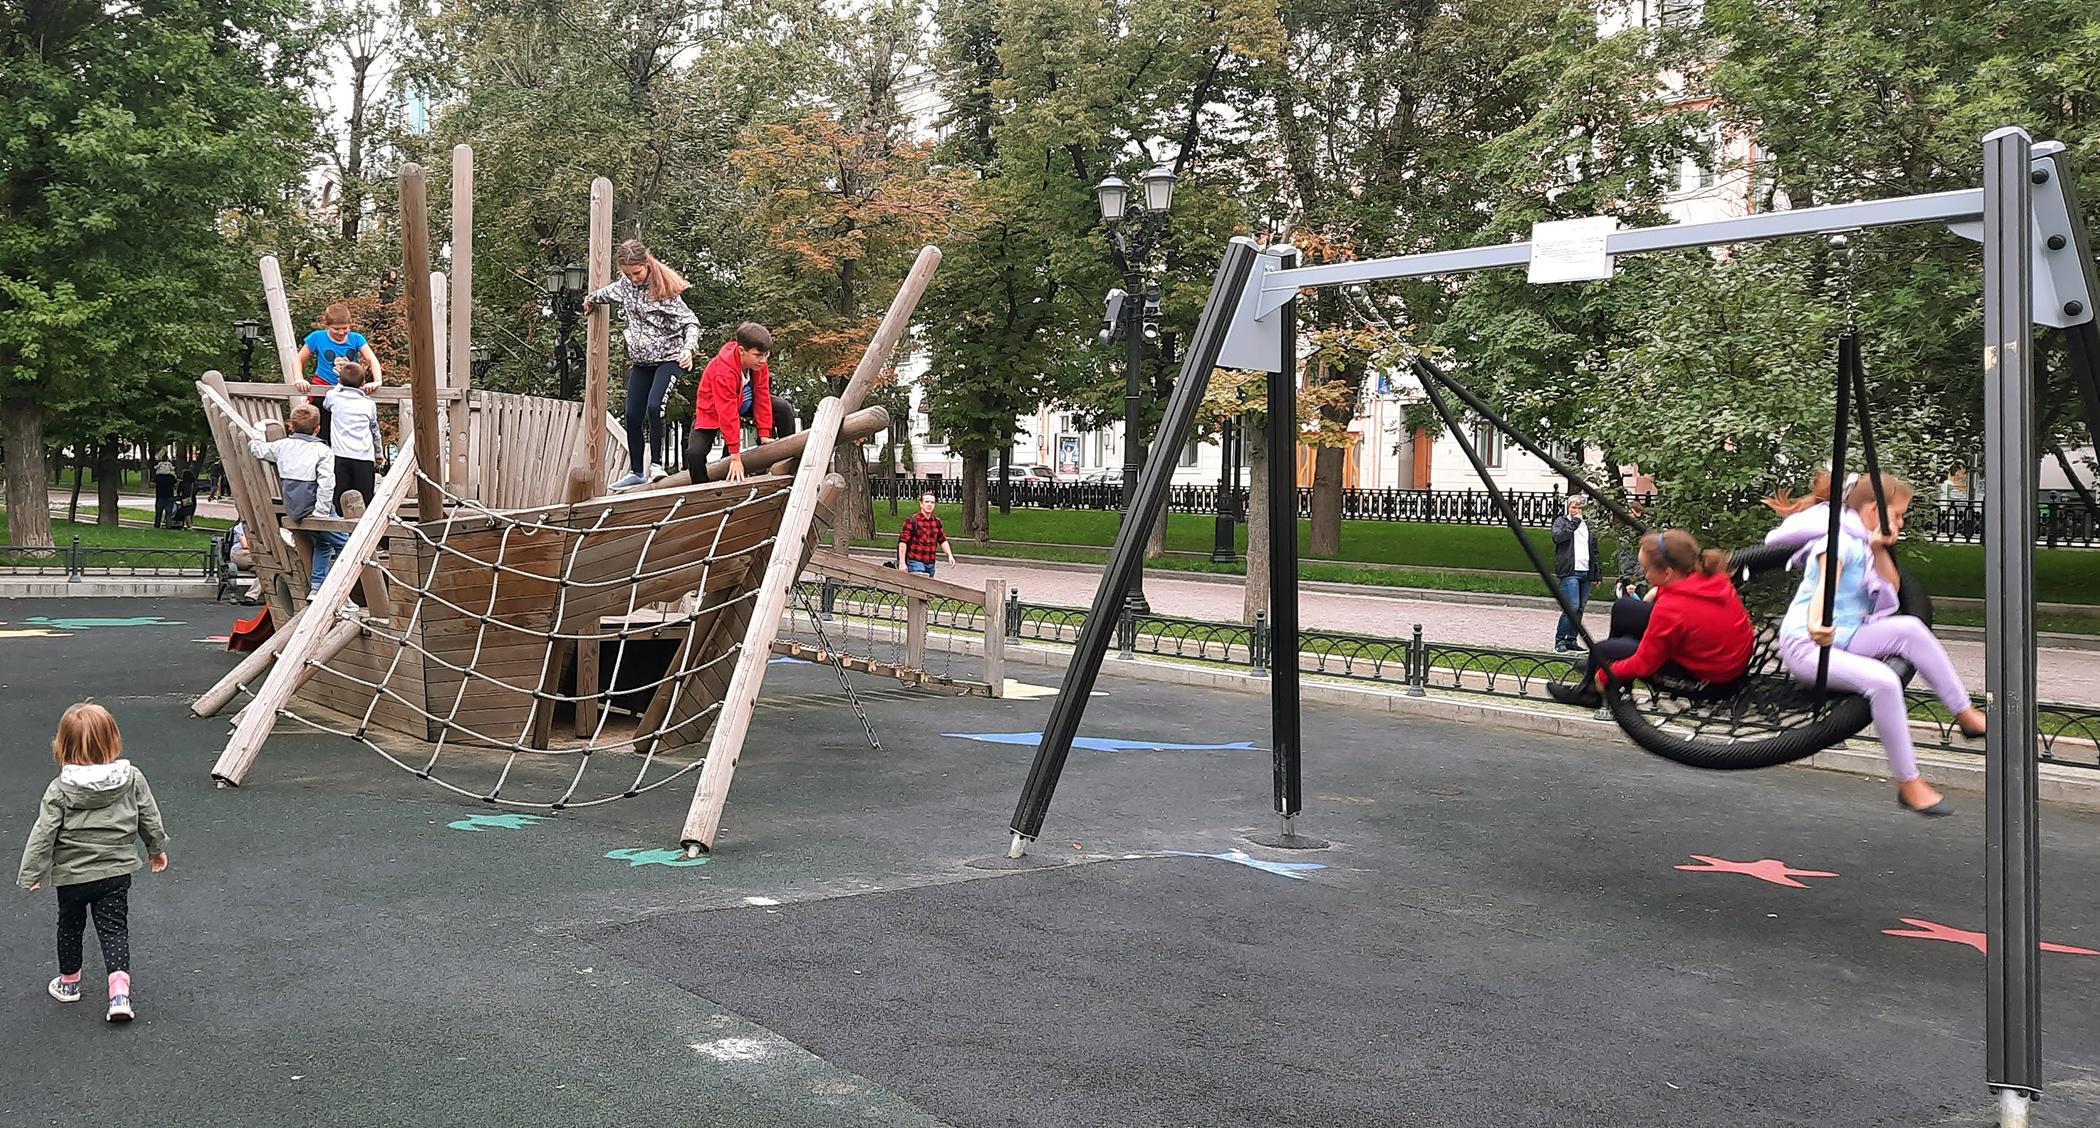 Parque infantil en Moscú